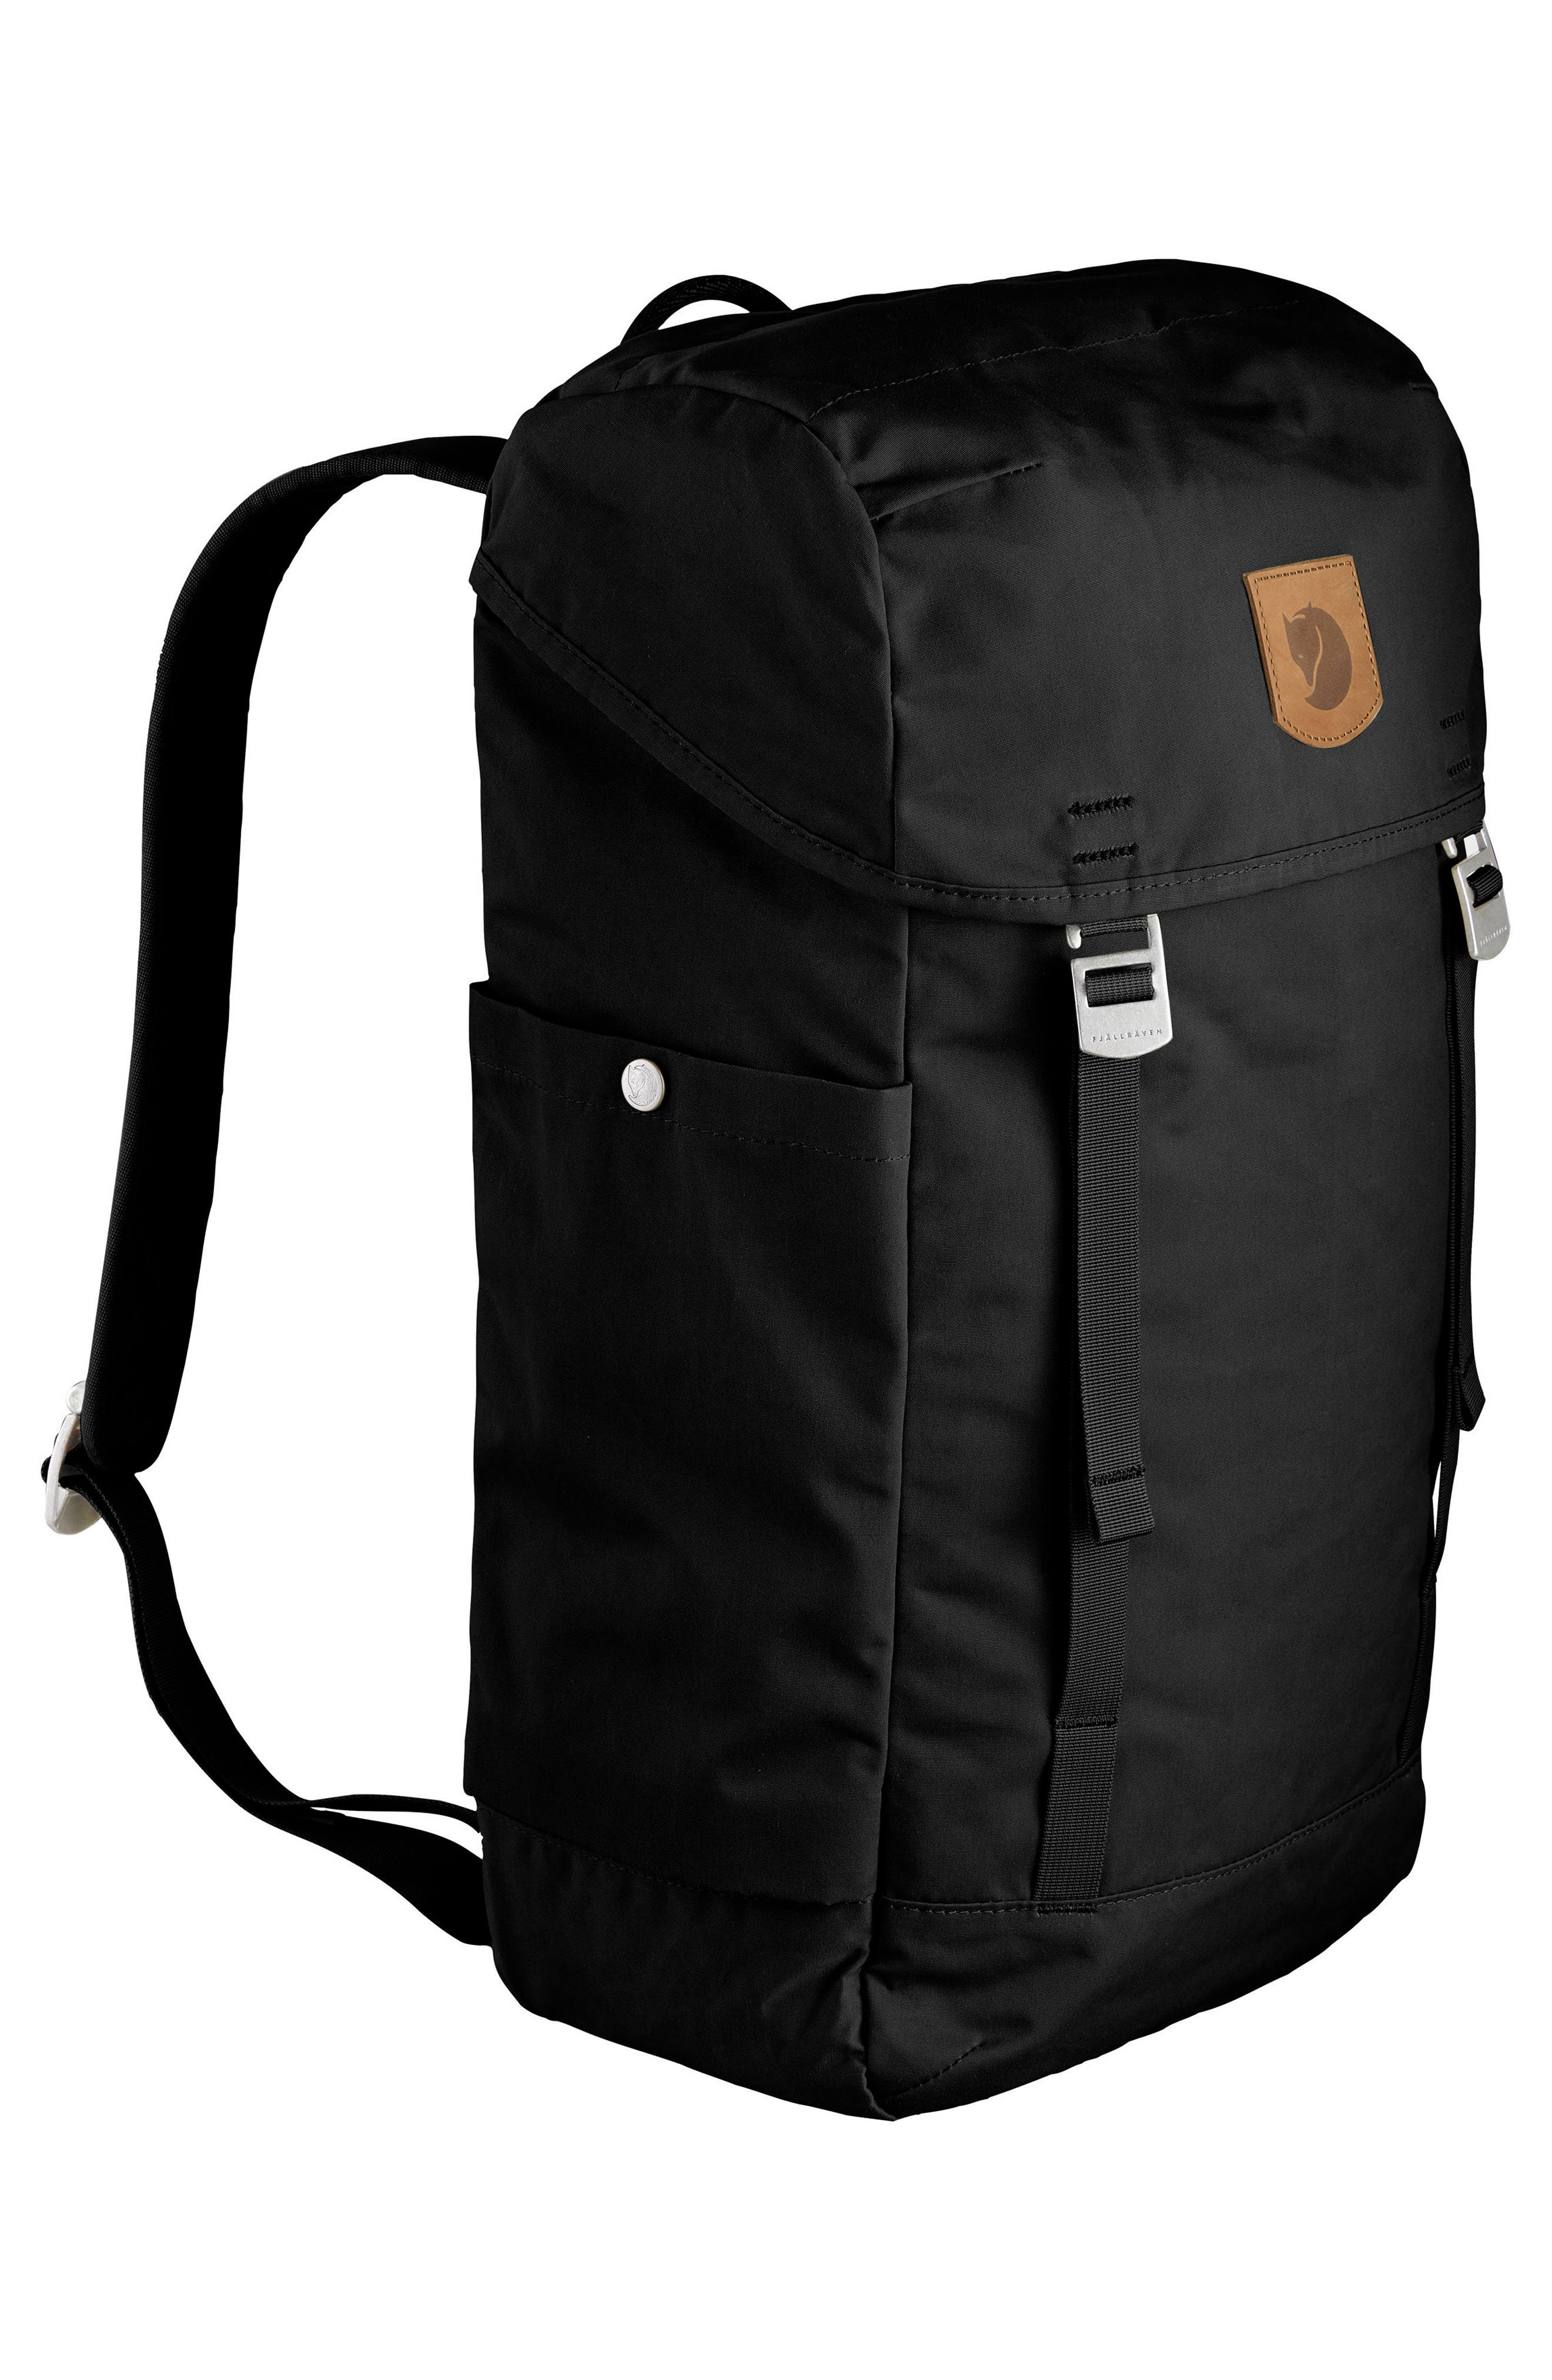 Greenland Large Backpack,                             Alternate thumbnail 3, color,                             001